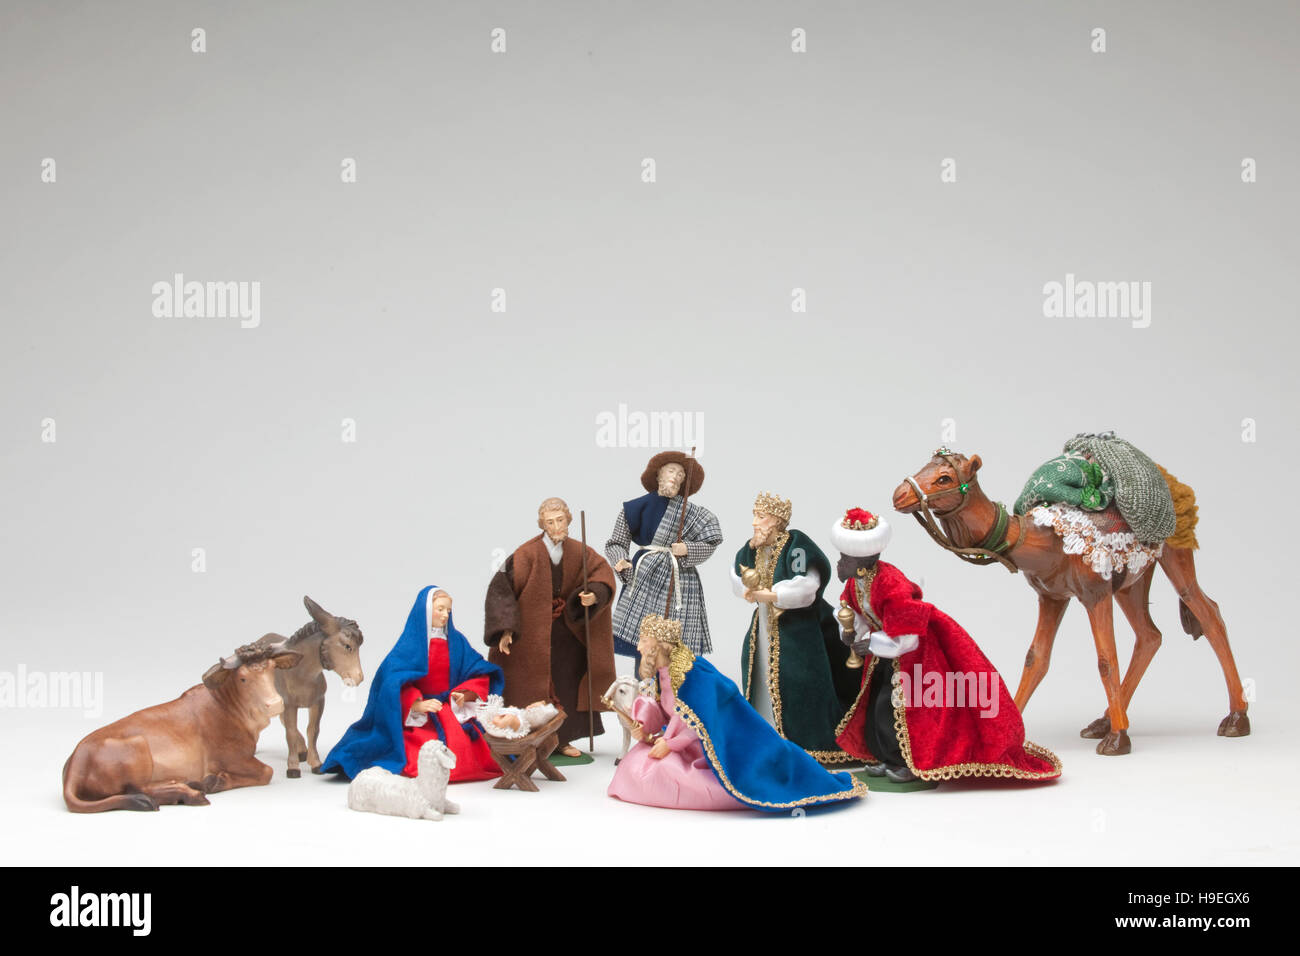 Krippenfiguren der Firma Lang aus Oberammergau - Stock Image